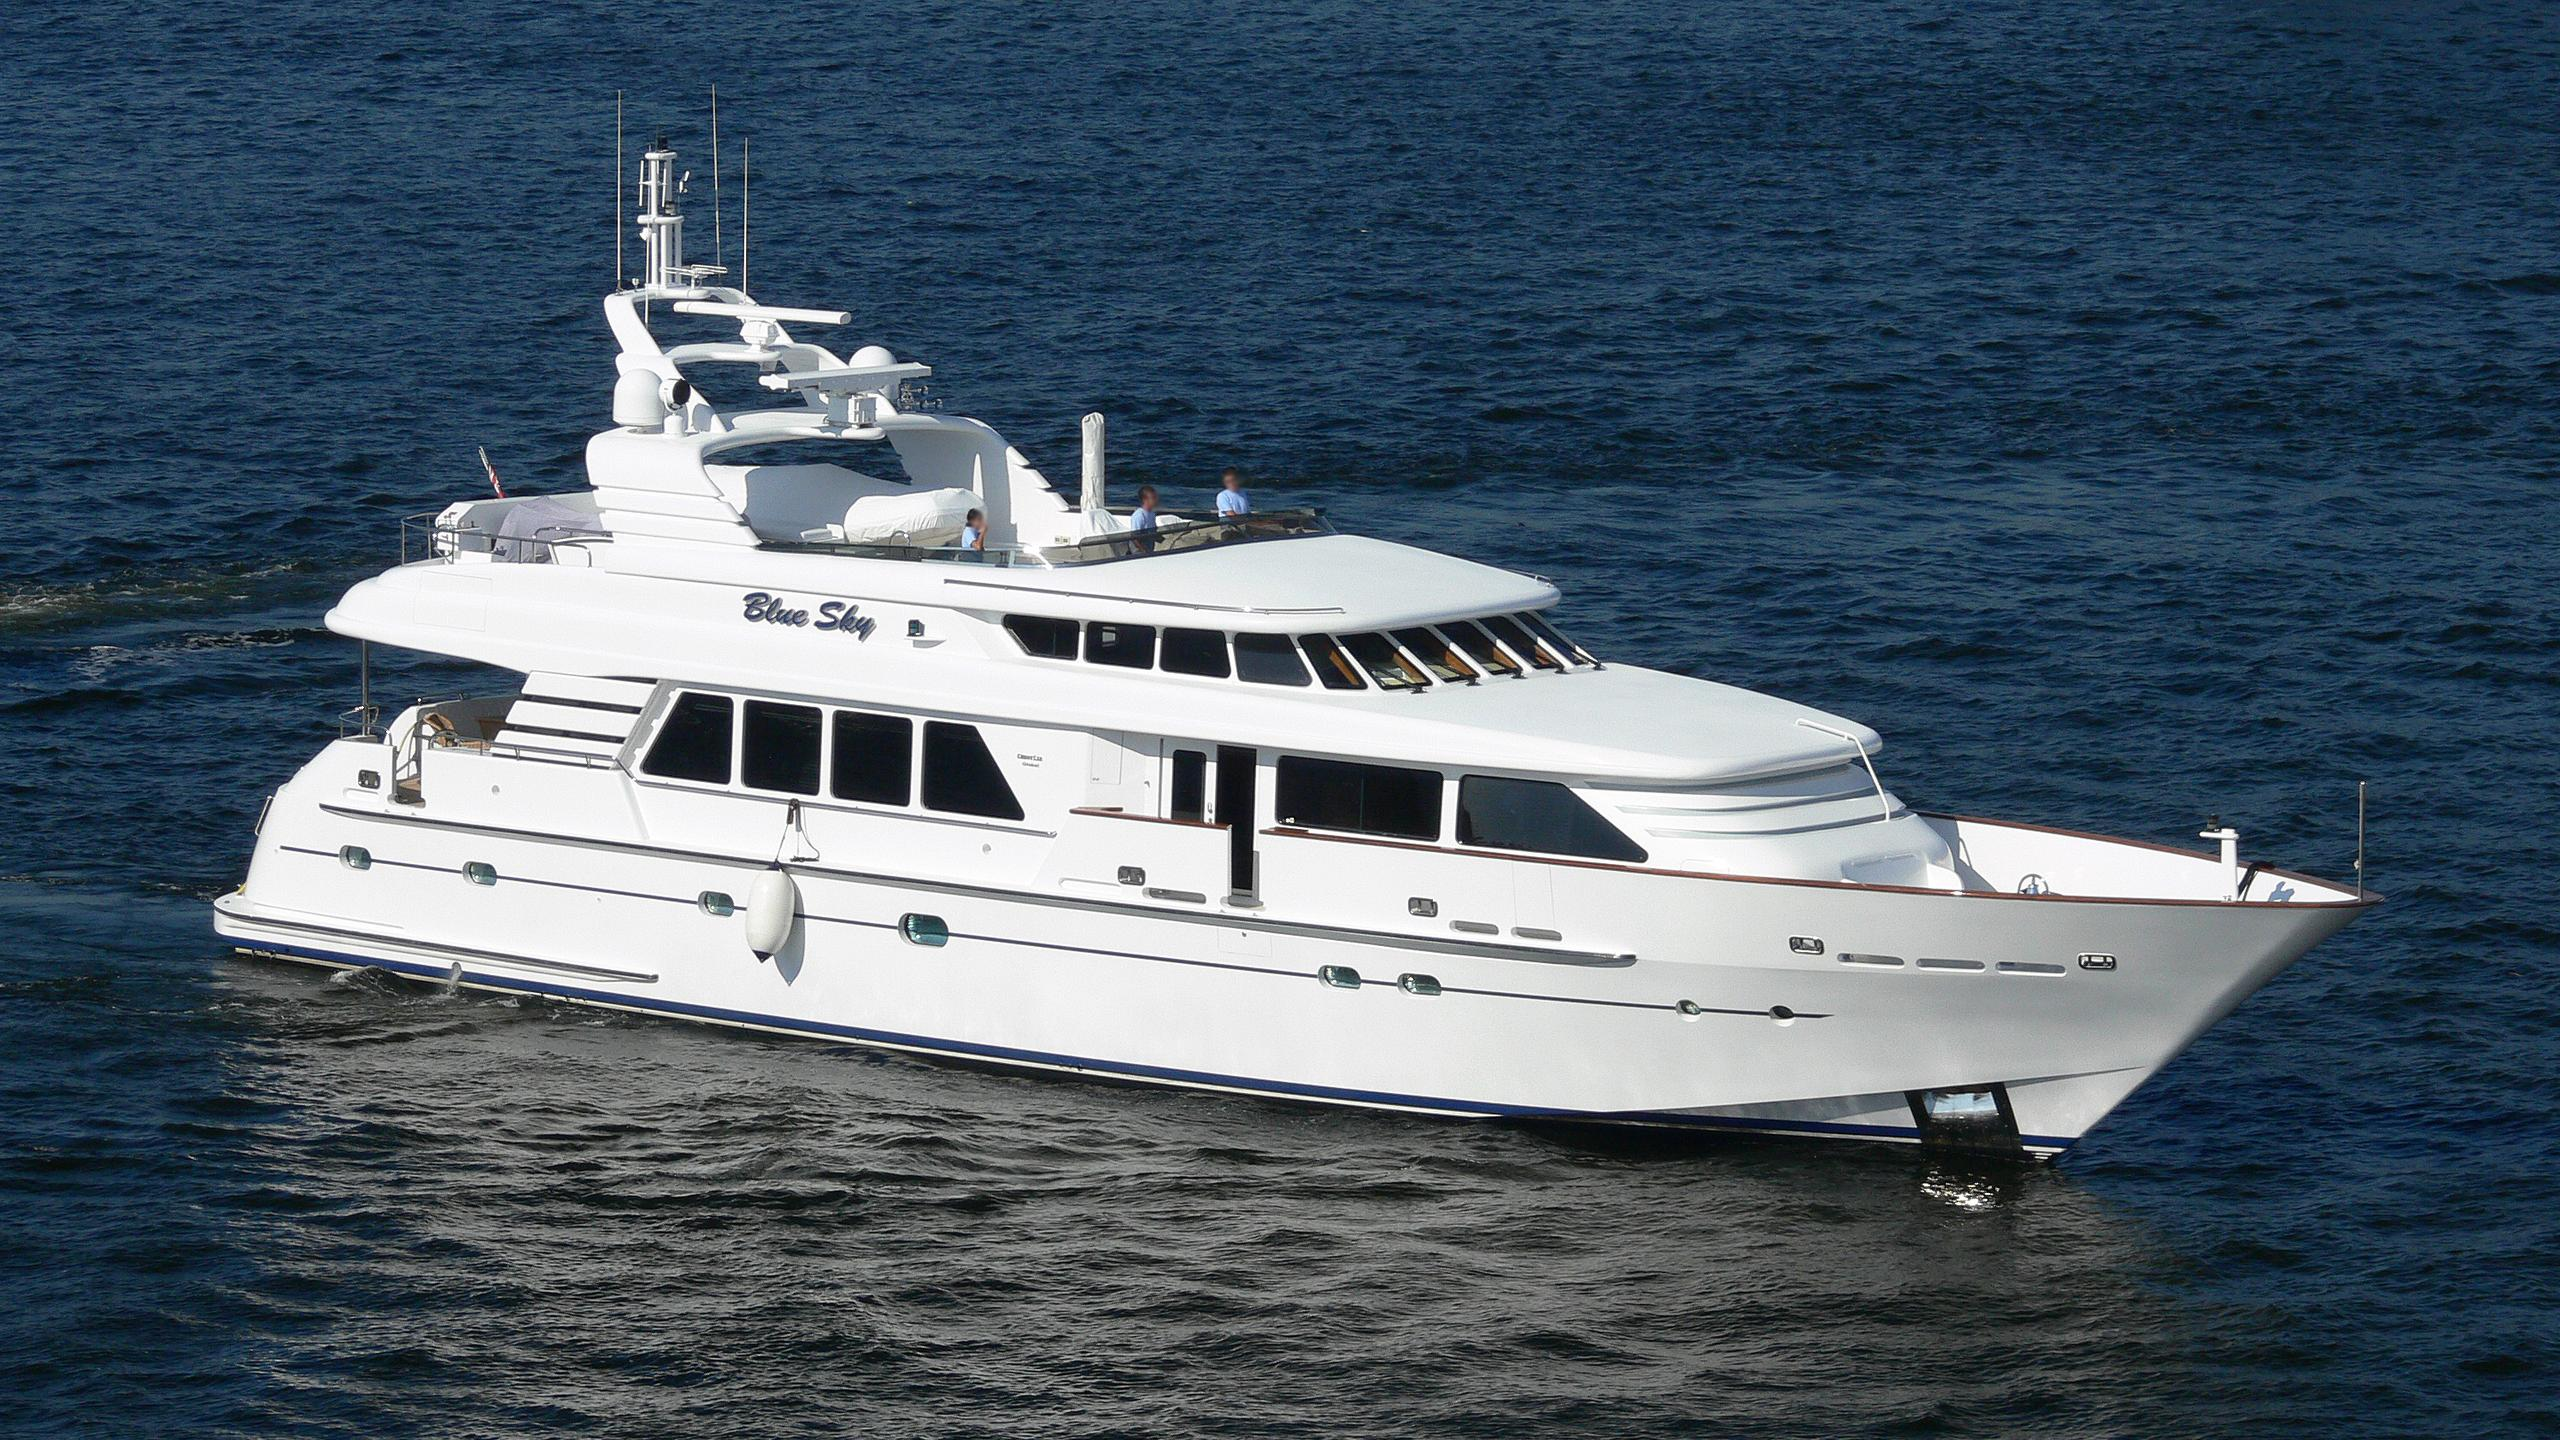 blue-sky-motor-yacht-cheoy-lee-global-103-2002-31m-profile